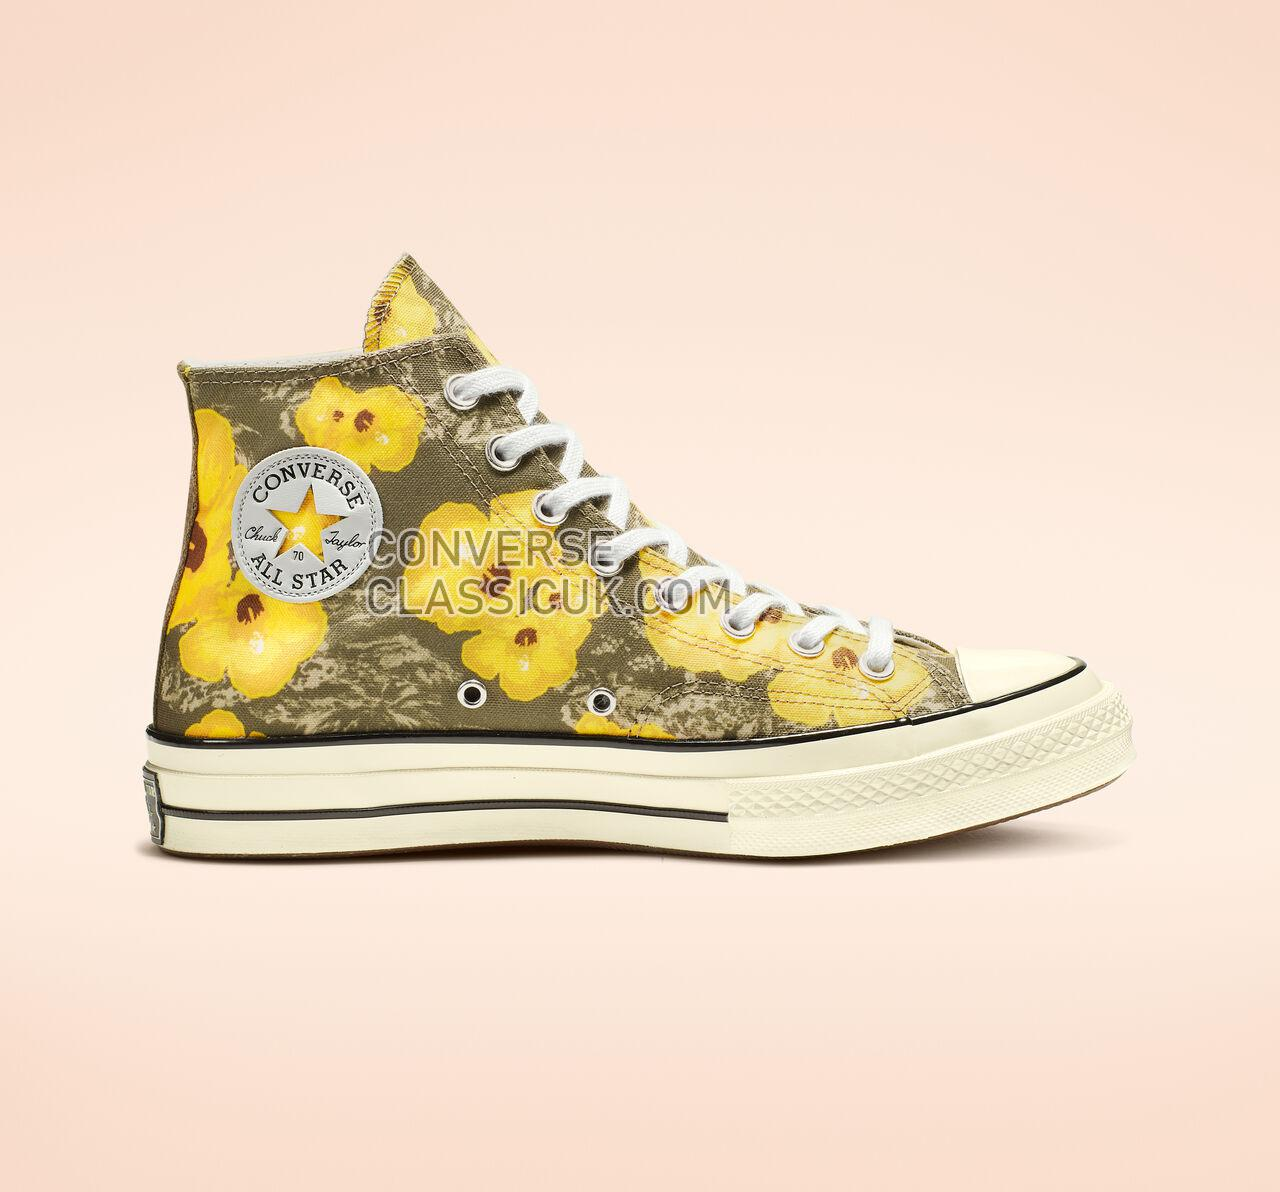 Converse Chuck 70 Paradise Floral High Top Mens Womens Unisex 164076C Field Surplus/Fresh Yellow Shoes